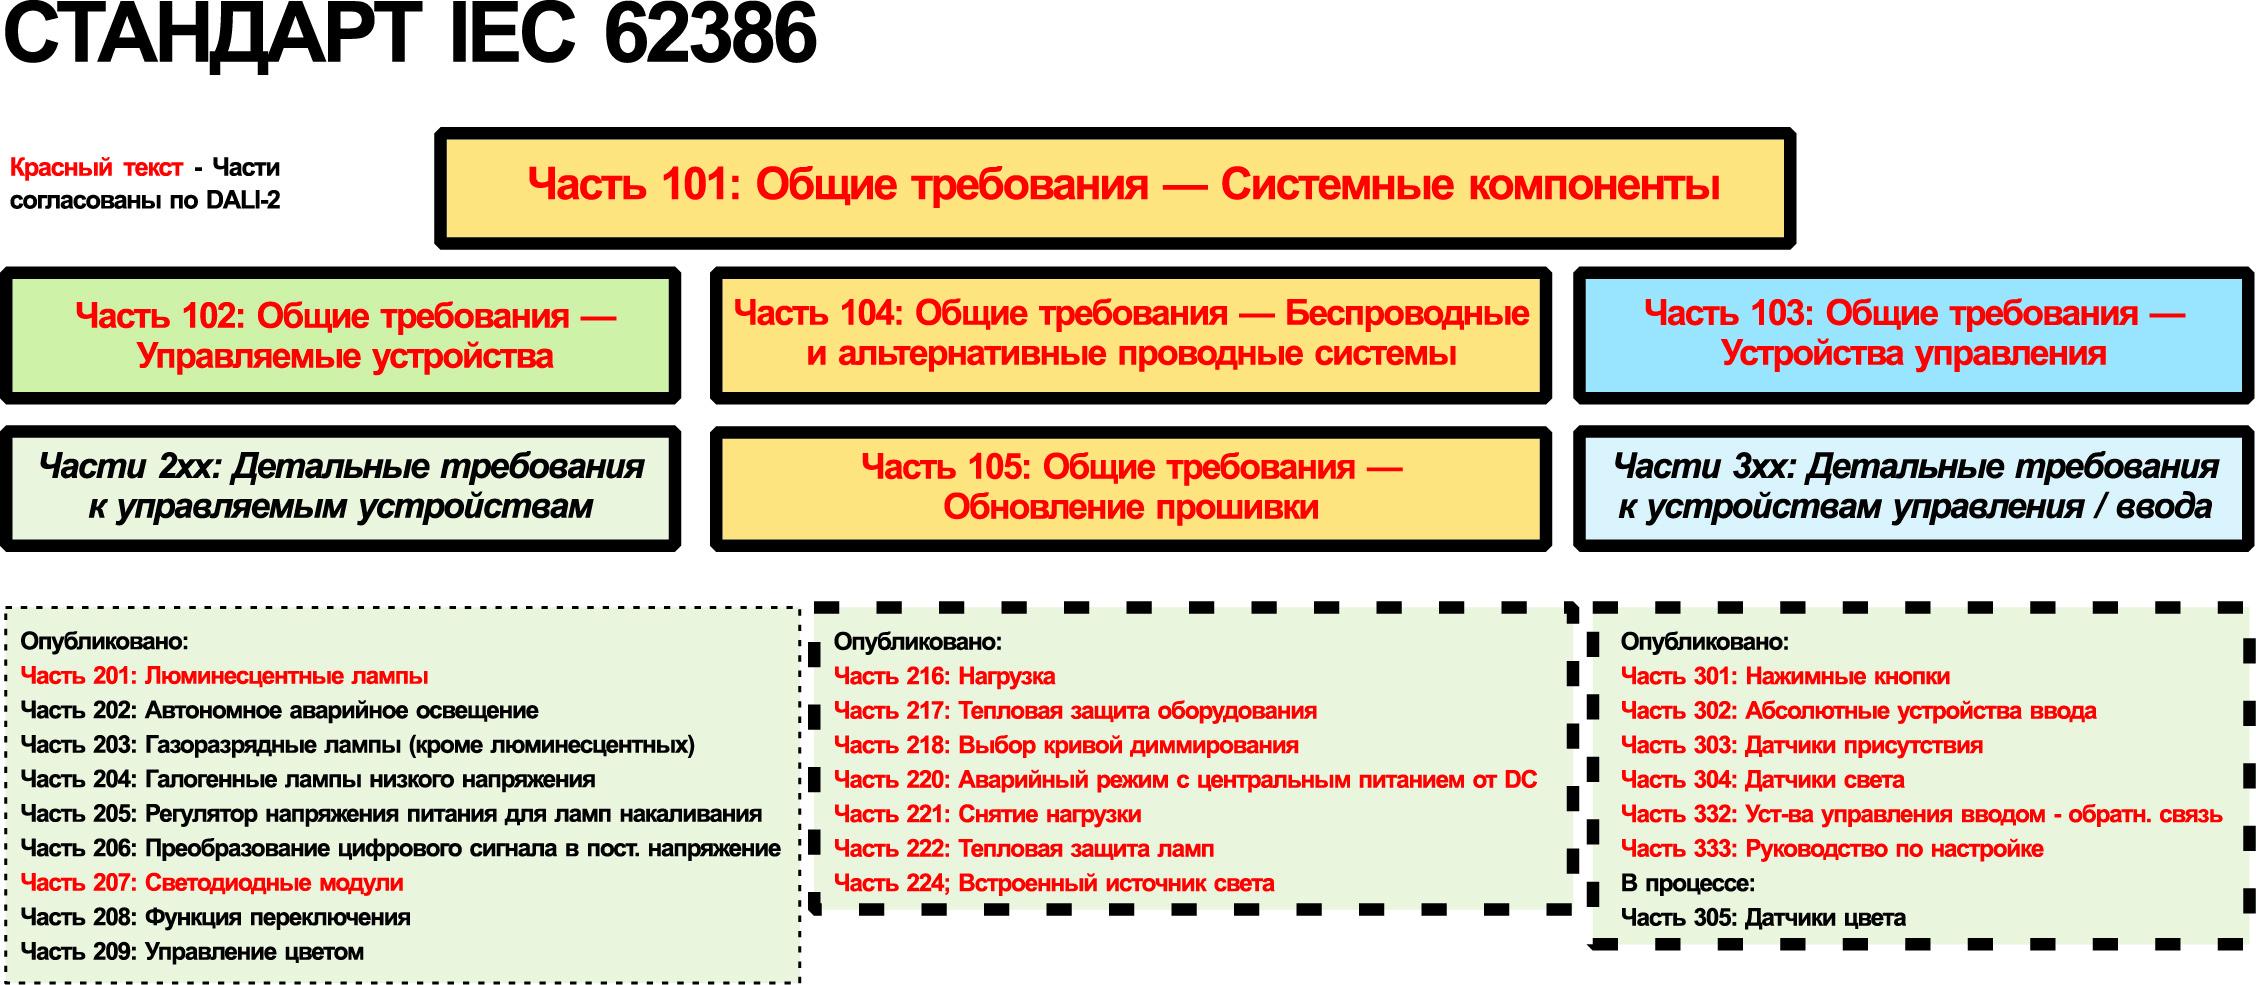 БП MOONS' MU050S150BQI501 с DT8 TW, соответствующий стандарту IEC 62386